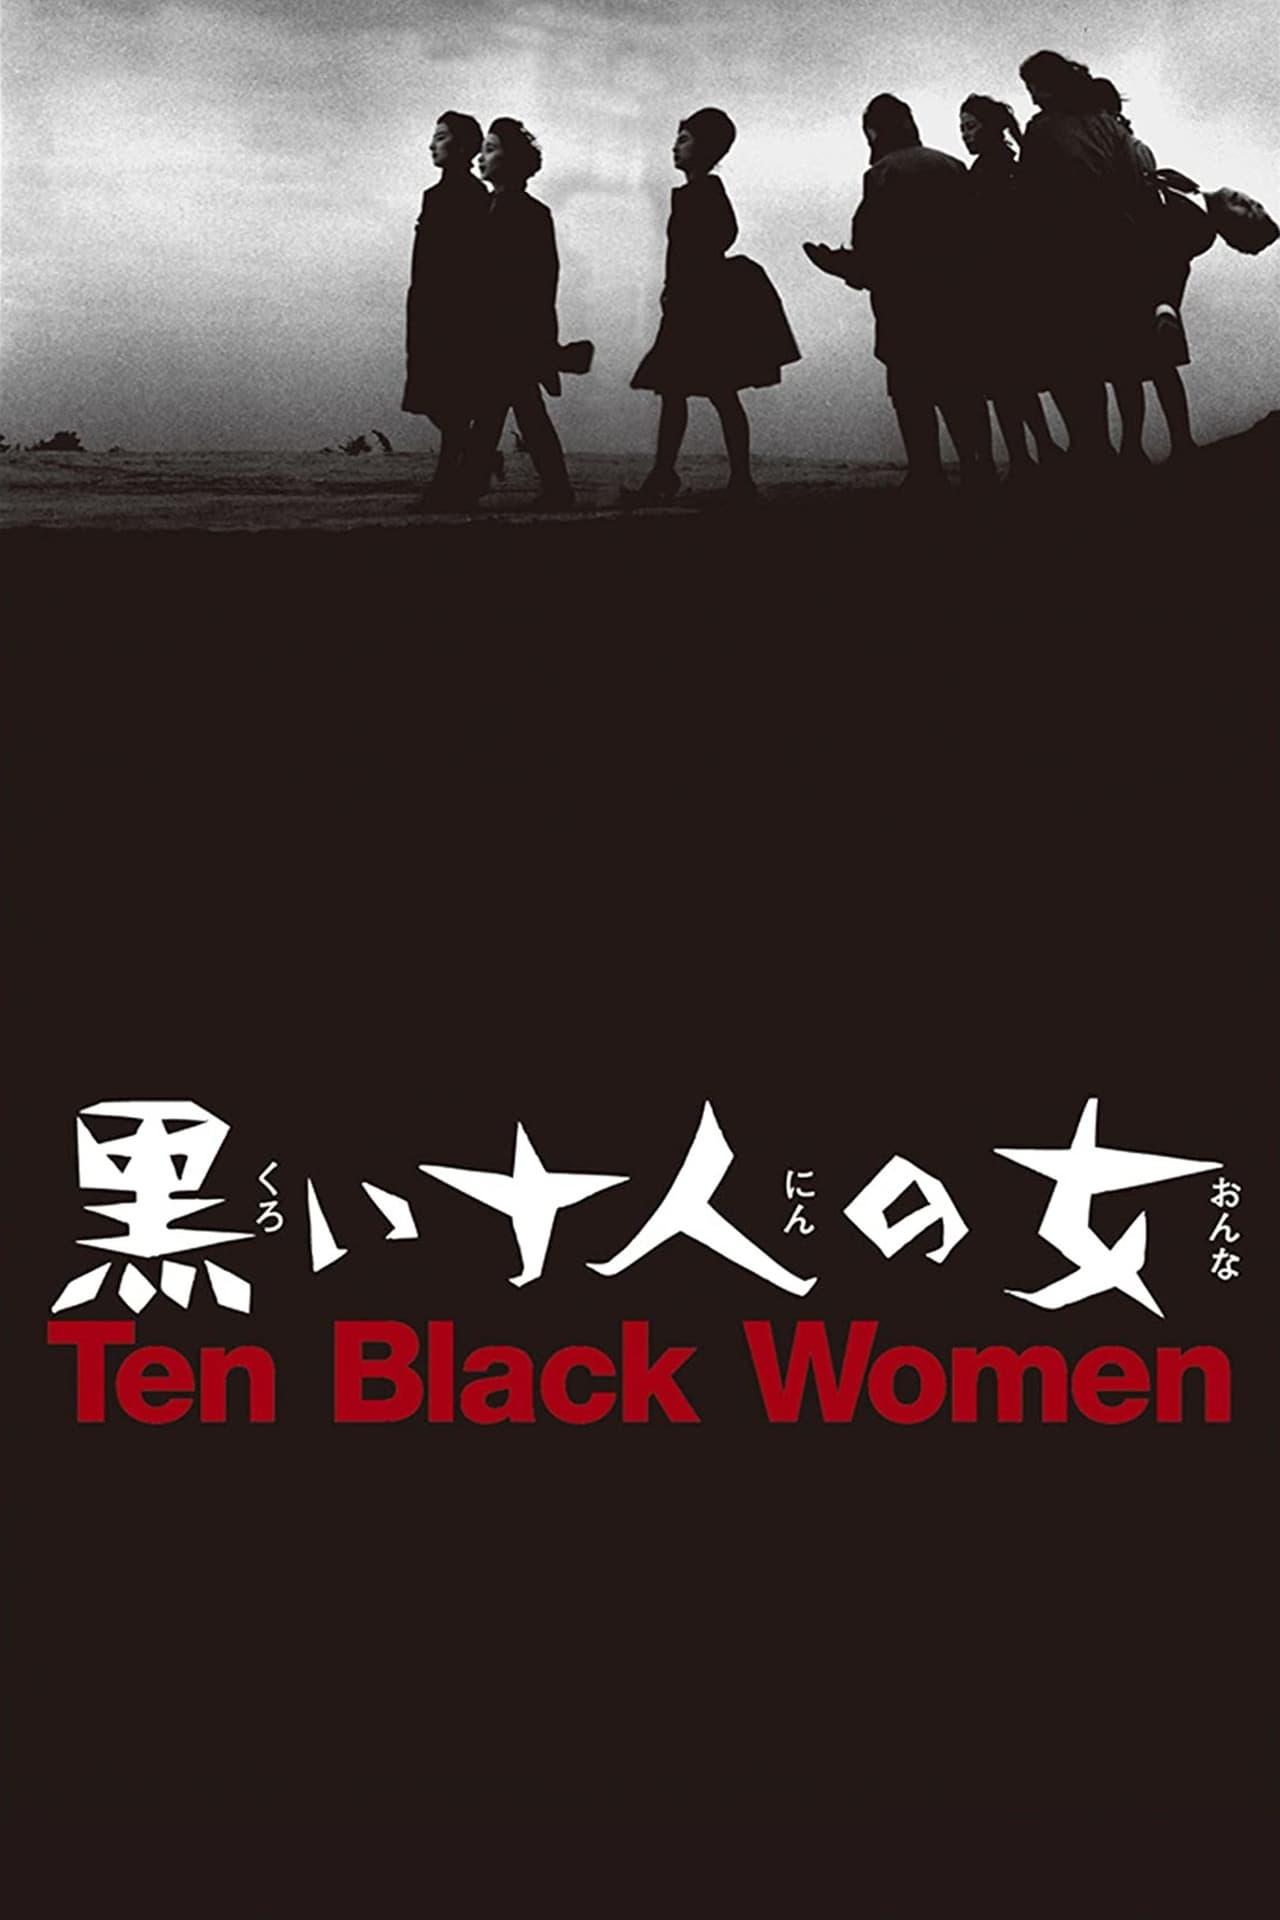 Ten Black Women